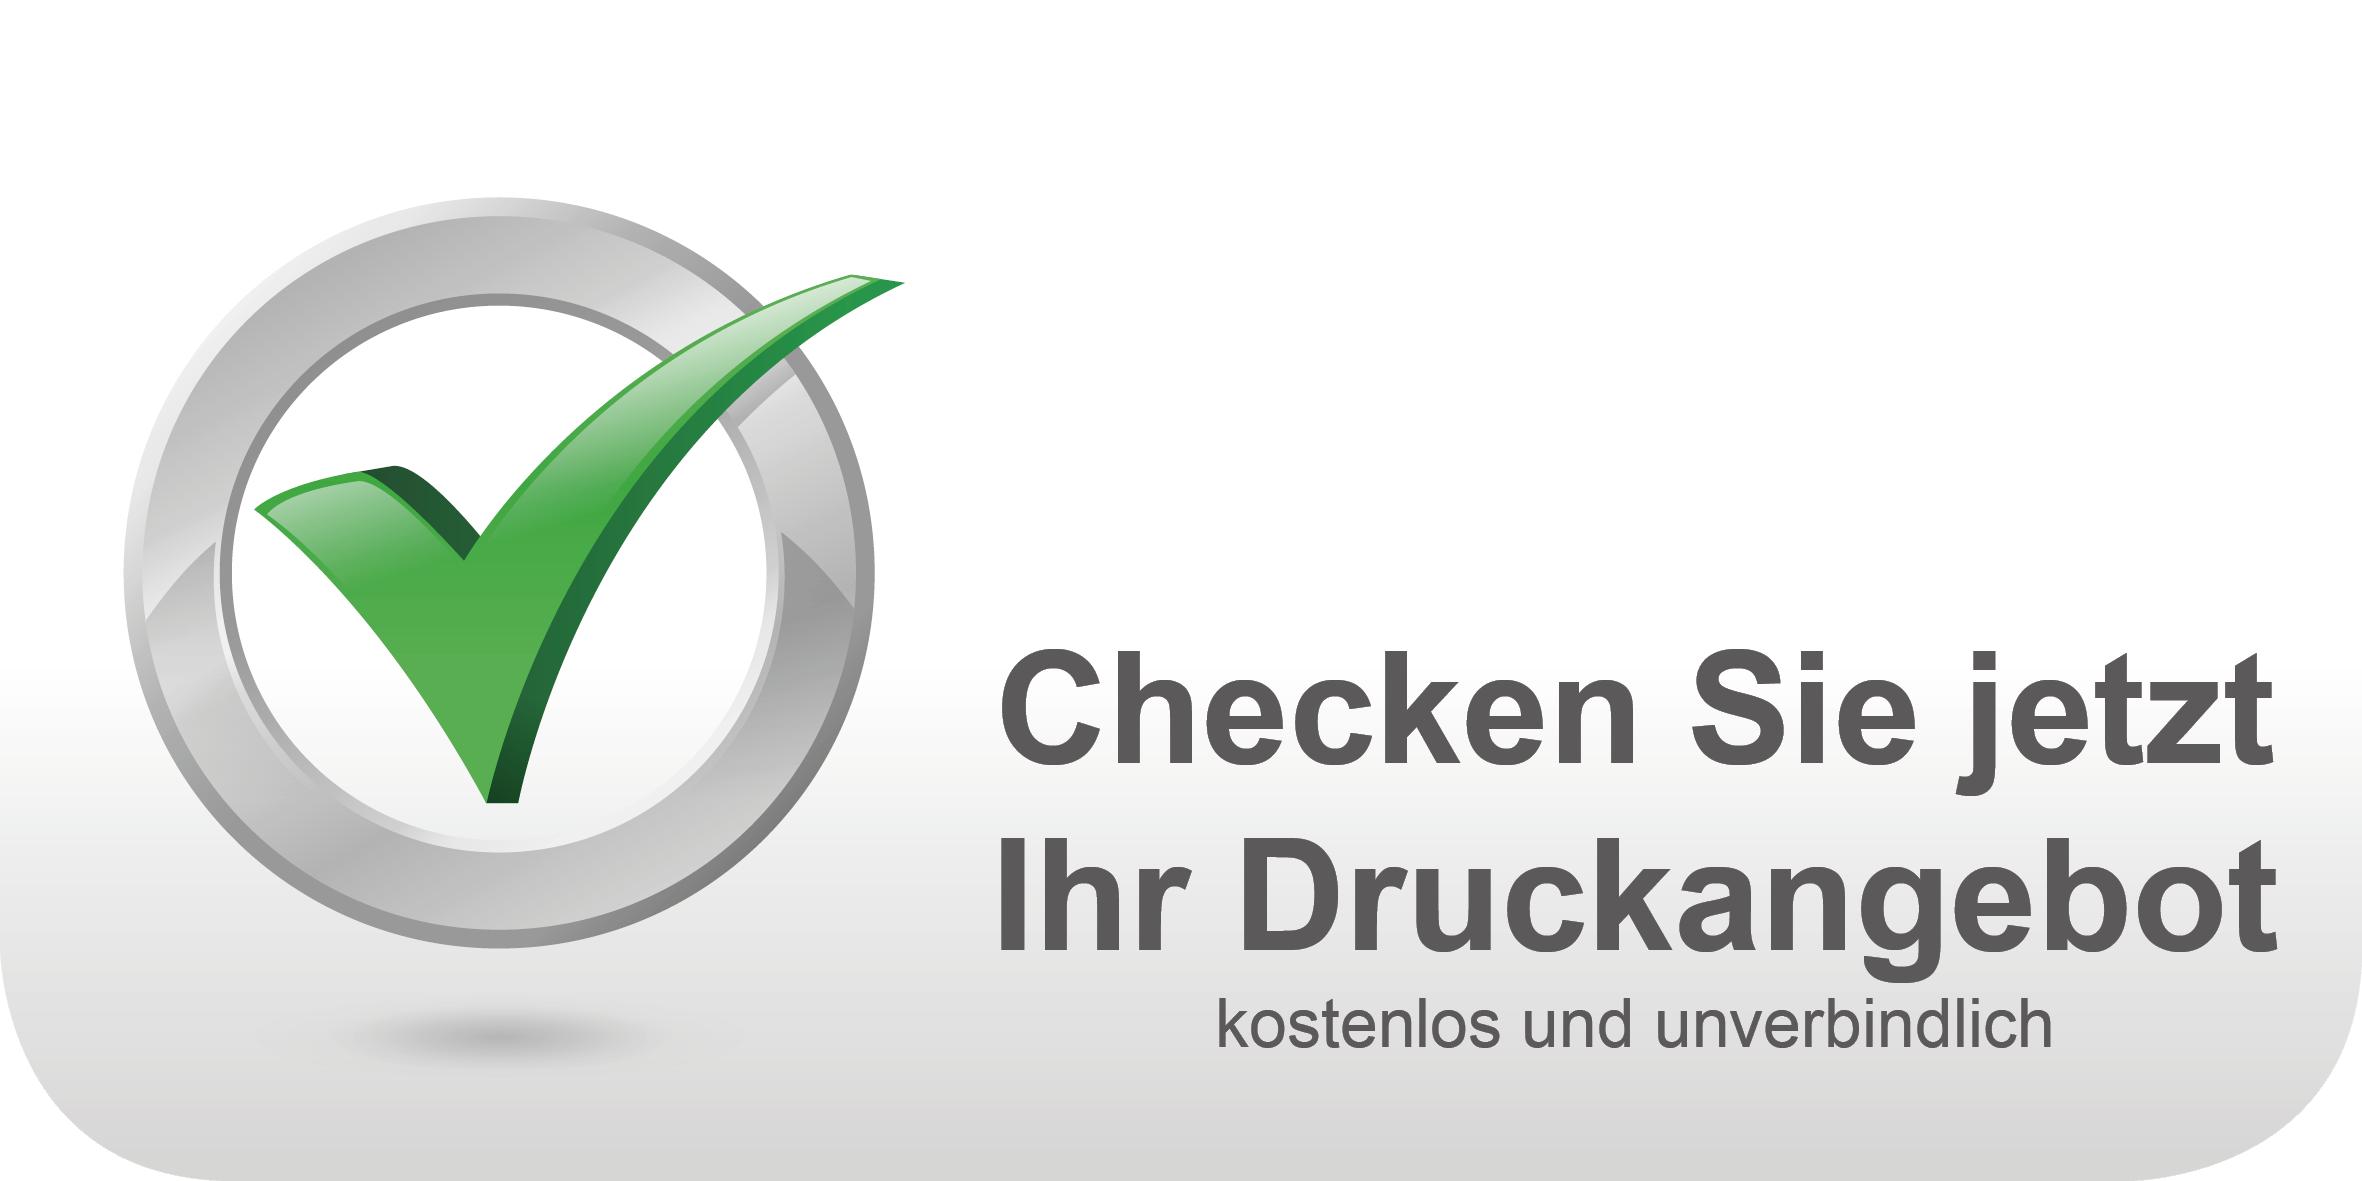 Angebots Check Druckerei Verlag K Urlaub Gmbh